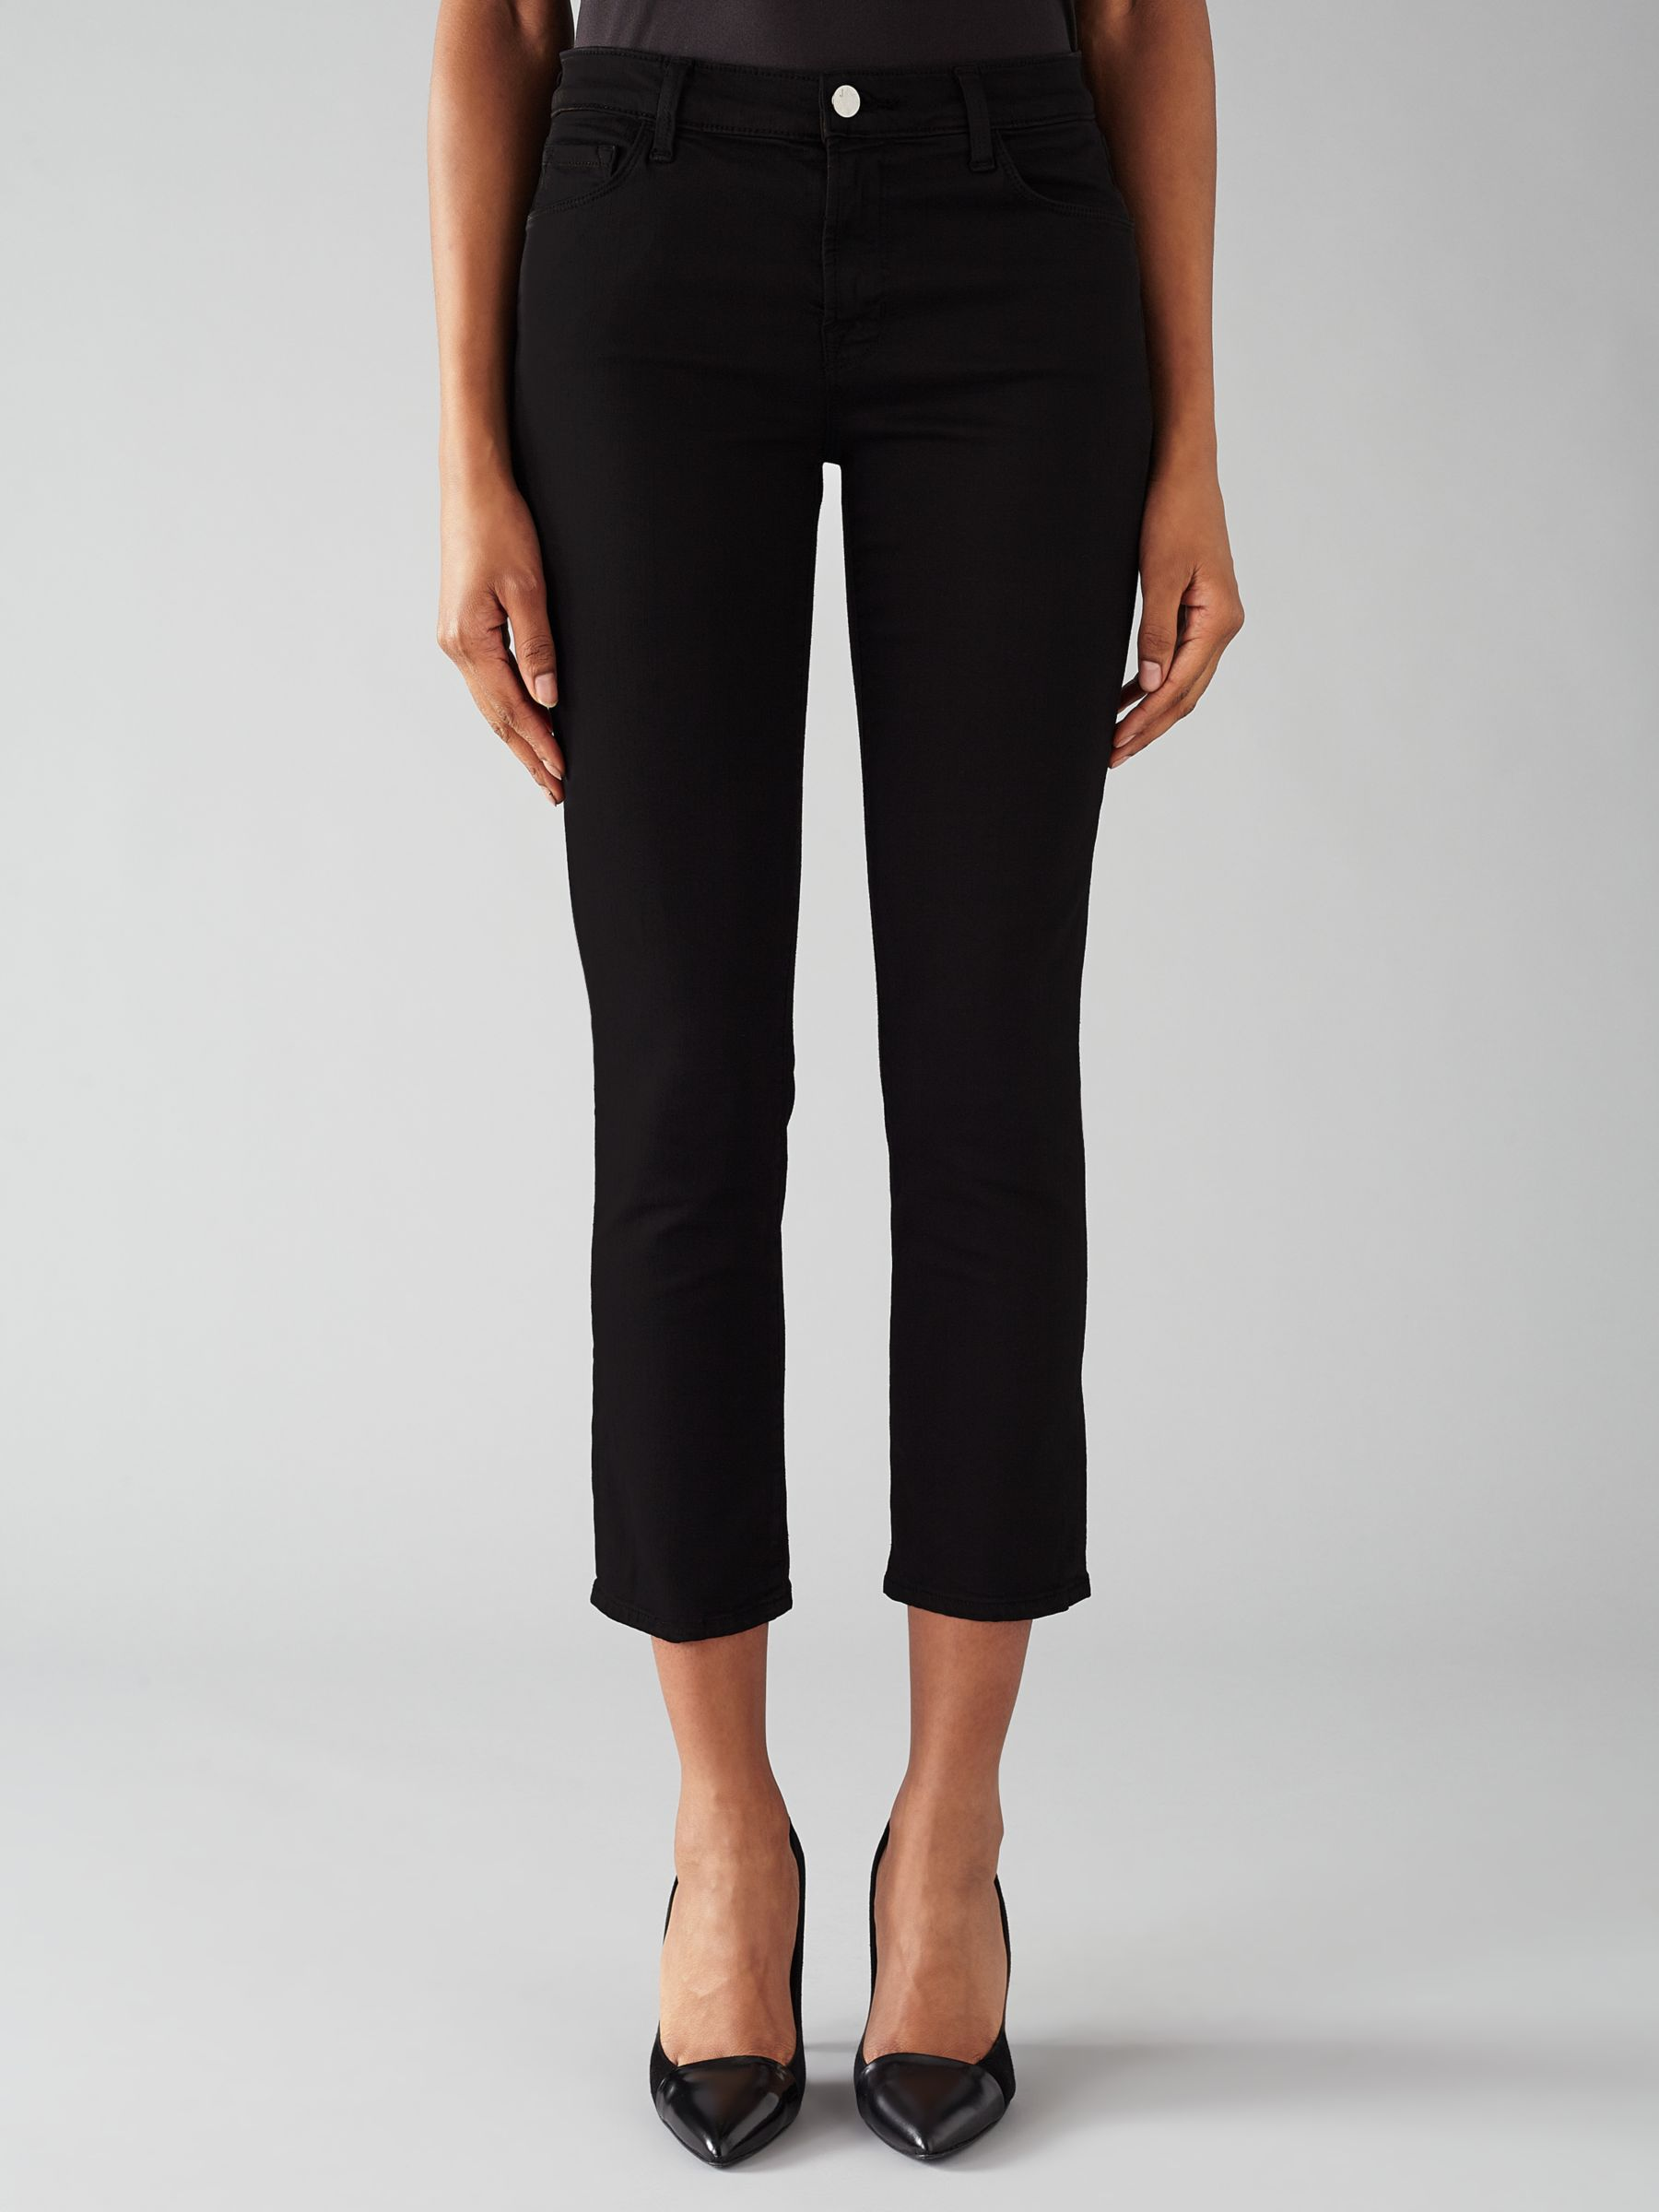 J Brand J Brand 8312 Cropped Flare Rail Jeans, Black